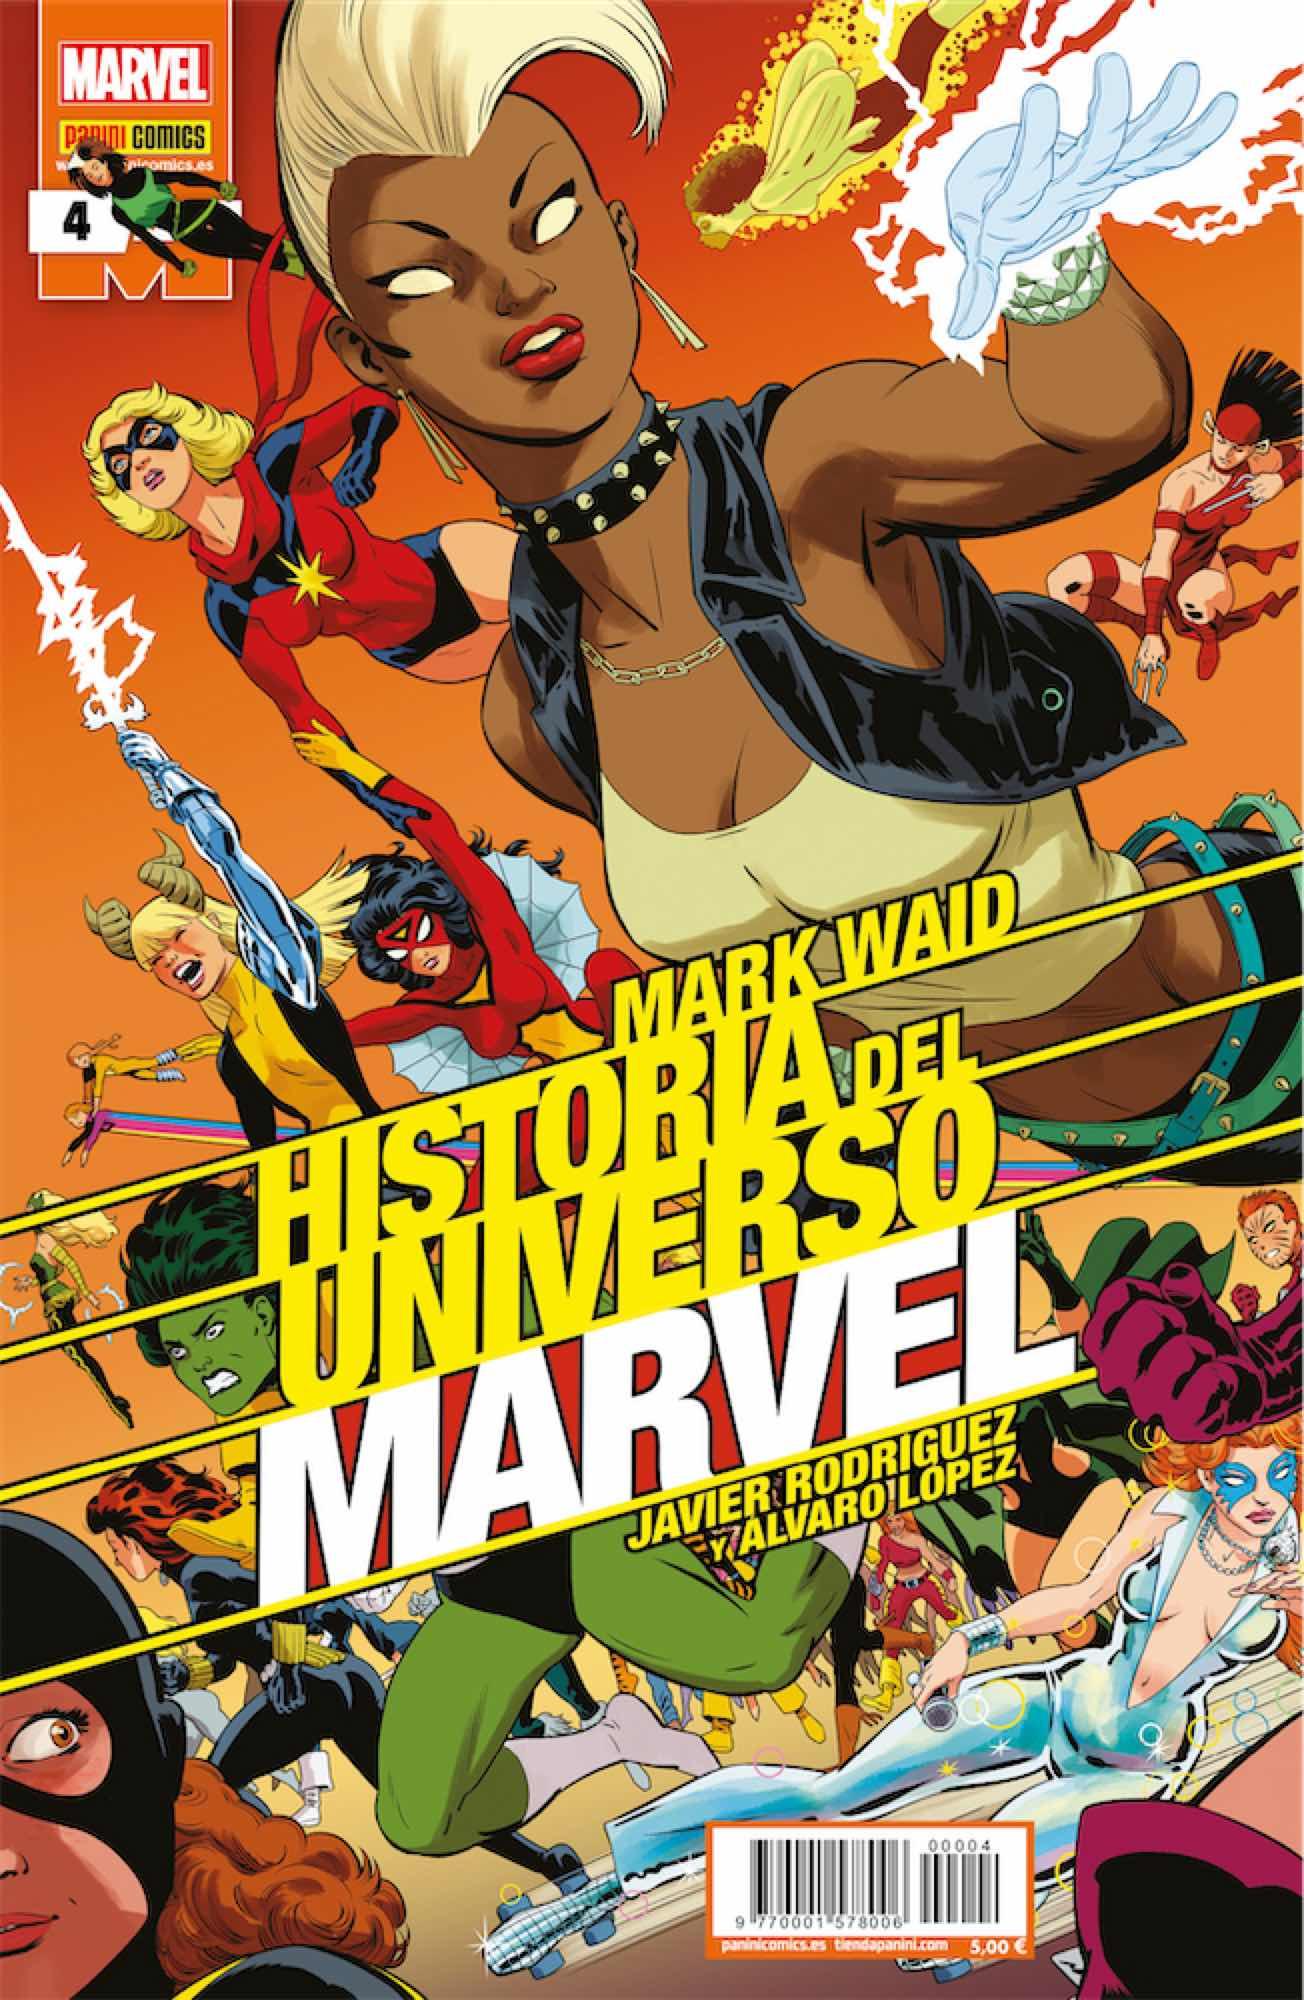 HISTORIA DEL UNIVERSO MARVEL 04 (EDICION ESPECIAL)